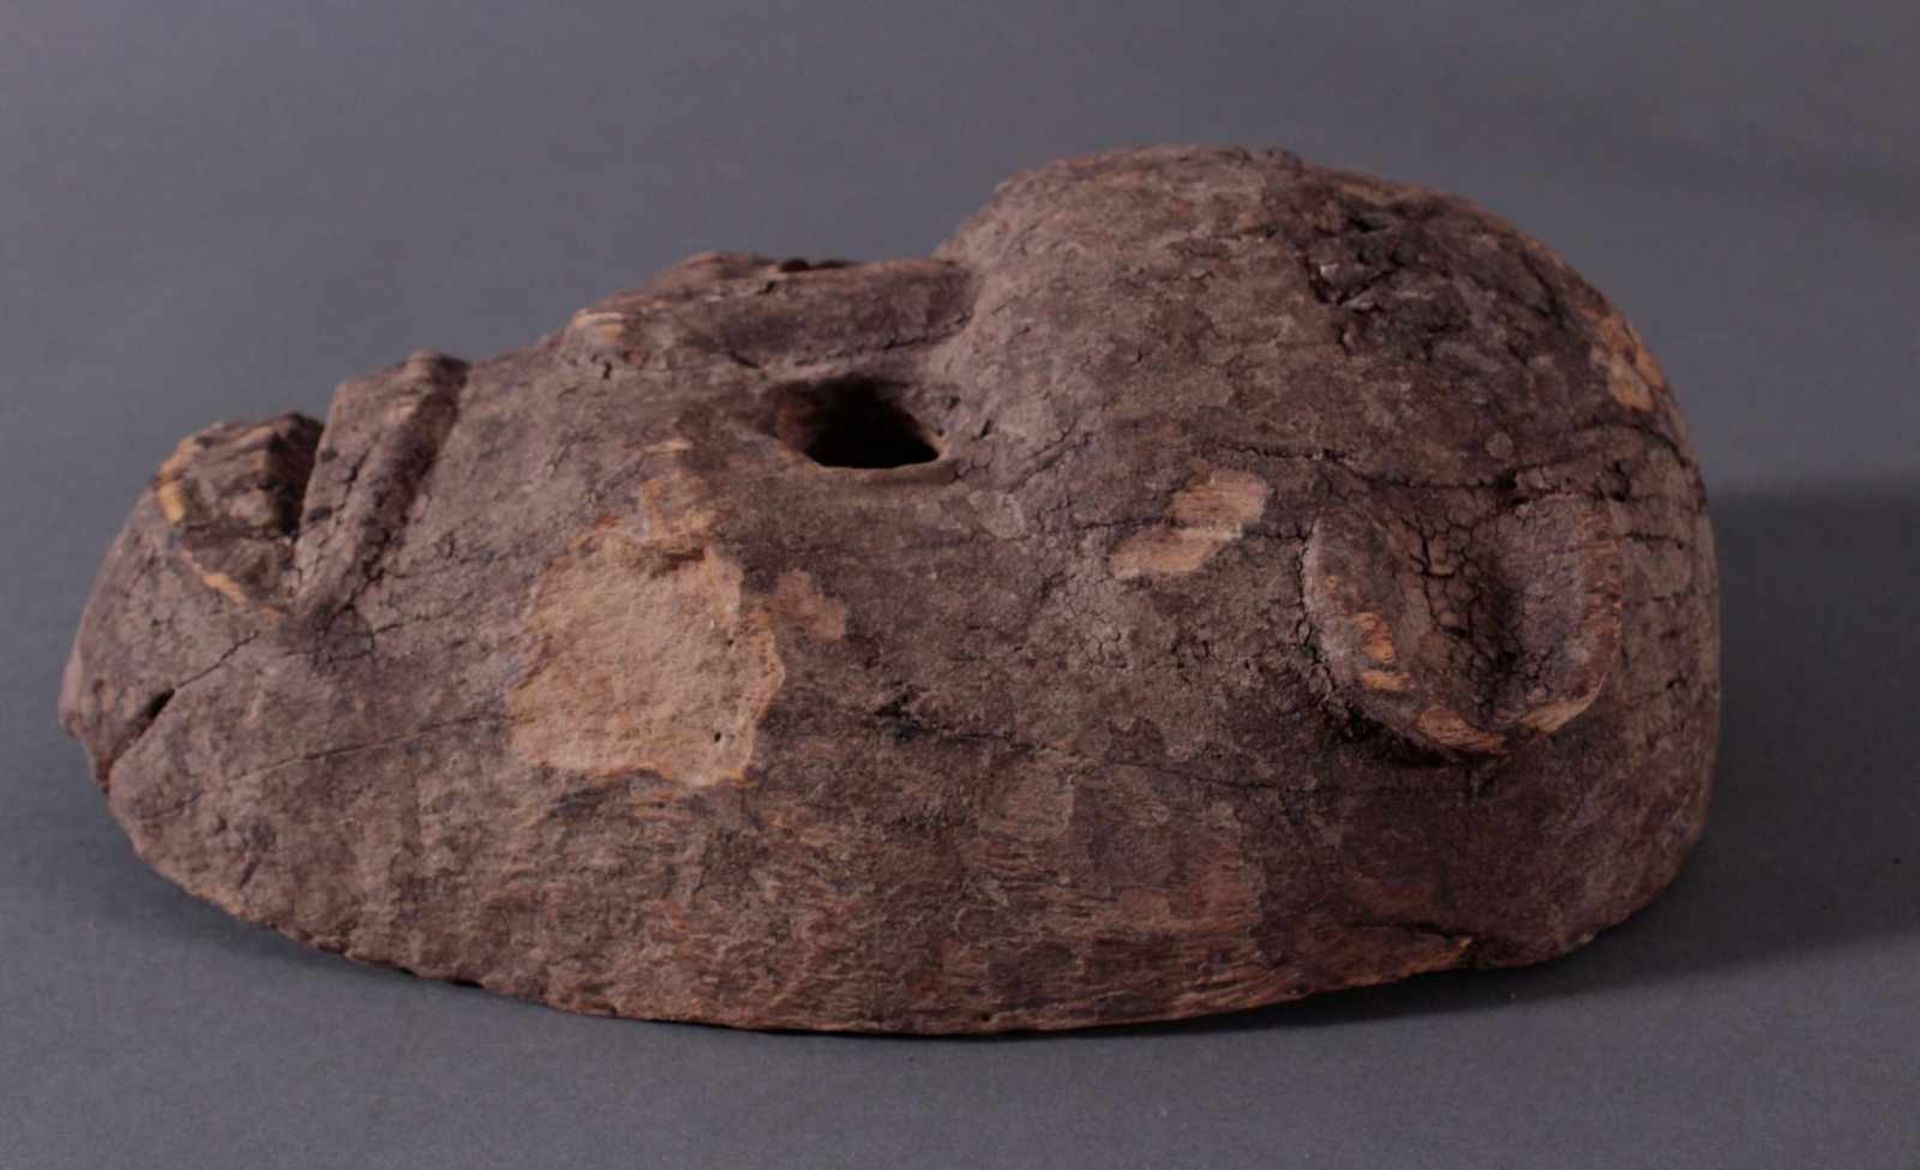 Antike Zoomorphe Maske, Makua, Tansania 1. Hälfte 20. Jh.Hartholzolz, alter Wurmfrass, dunkle Patina - Bild 3 aus 6